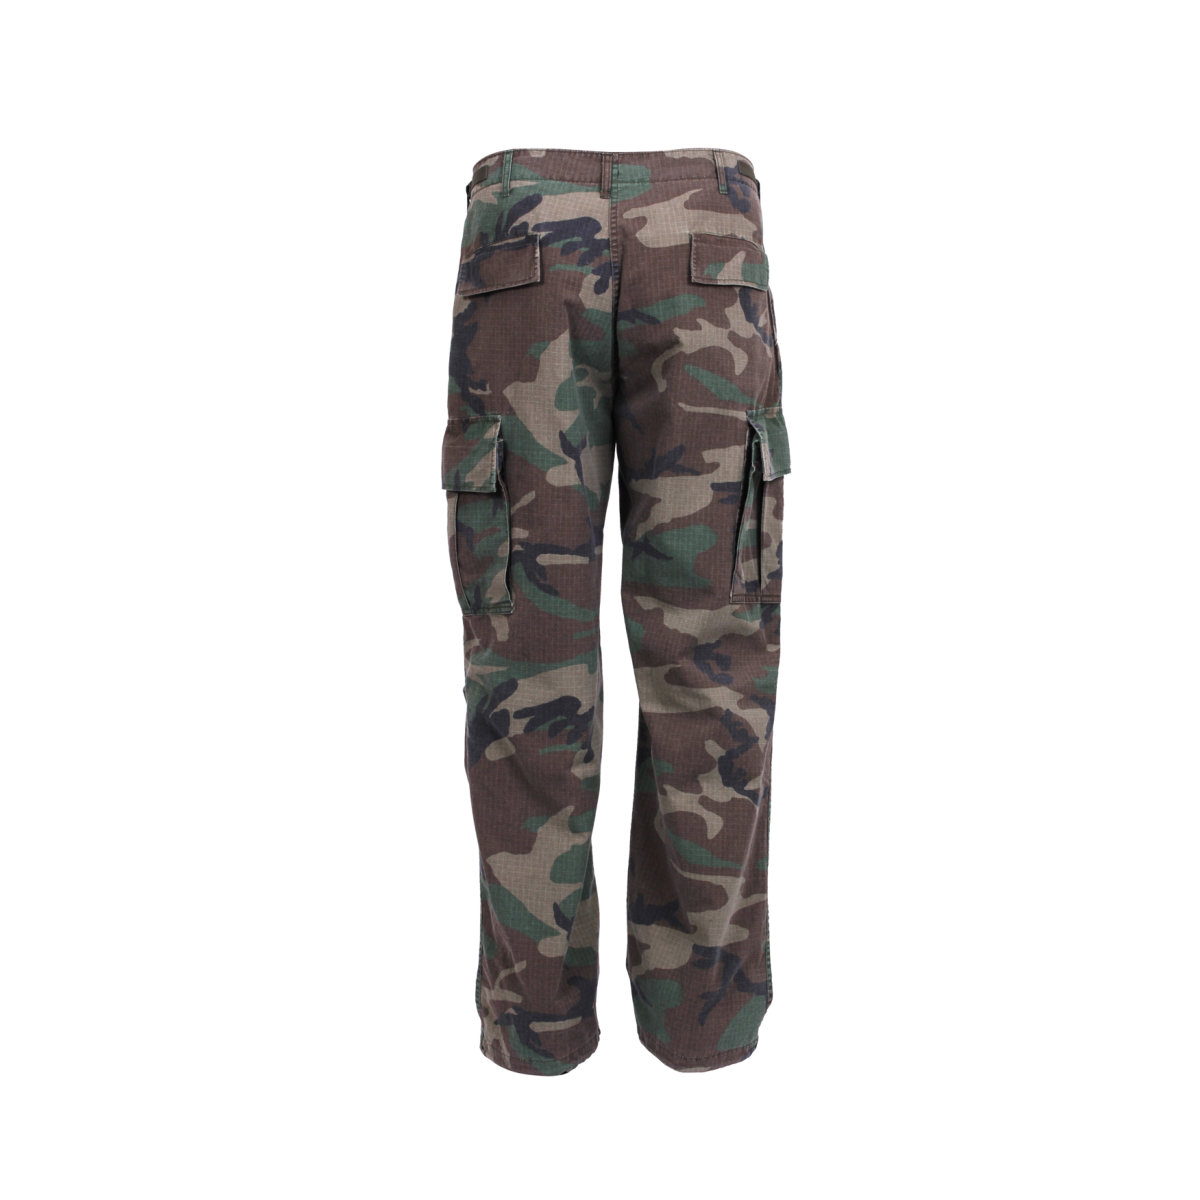 vietnam era camouflage army pants fatigues woodland camo